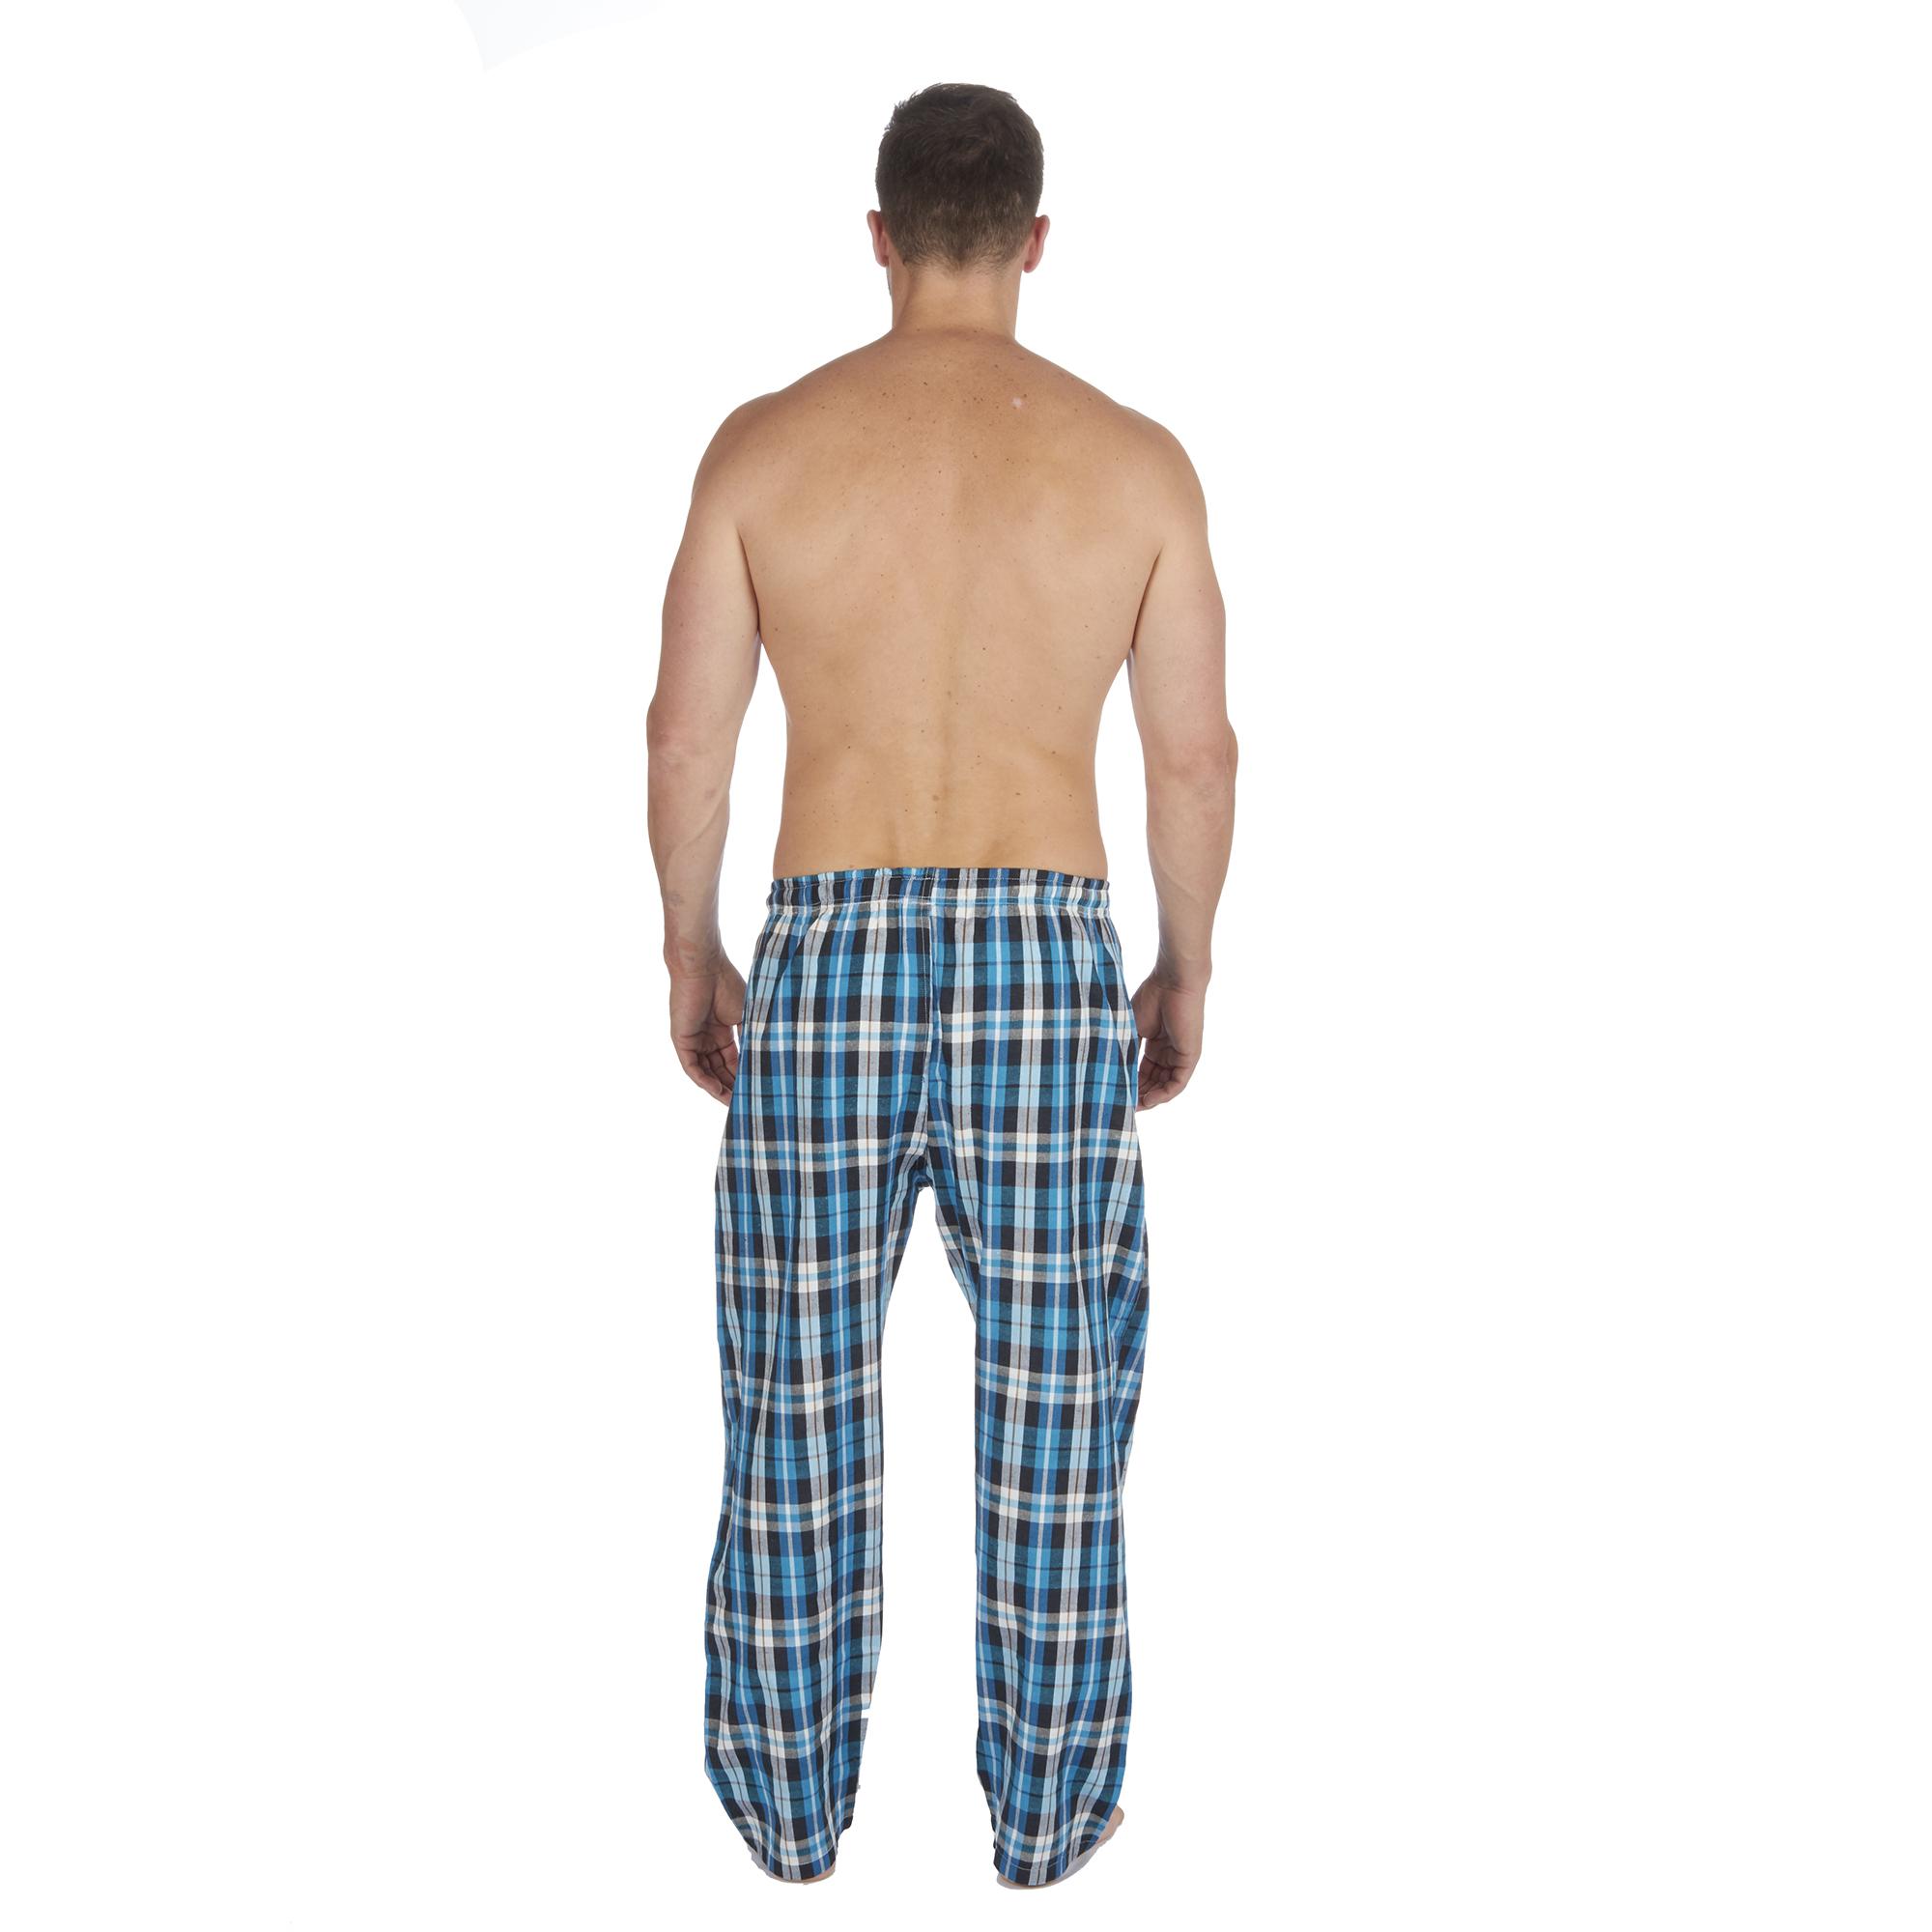 Jason-Jones-Homme-Carreaux-Tisse-Pyjama-Pantalon-en-Coton-Melange-Serge-PJ-Lounge-Pants miniature 22